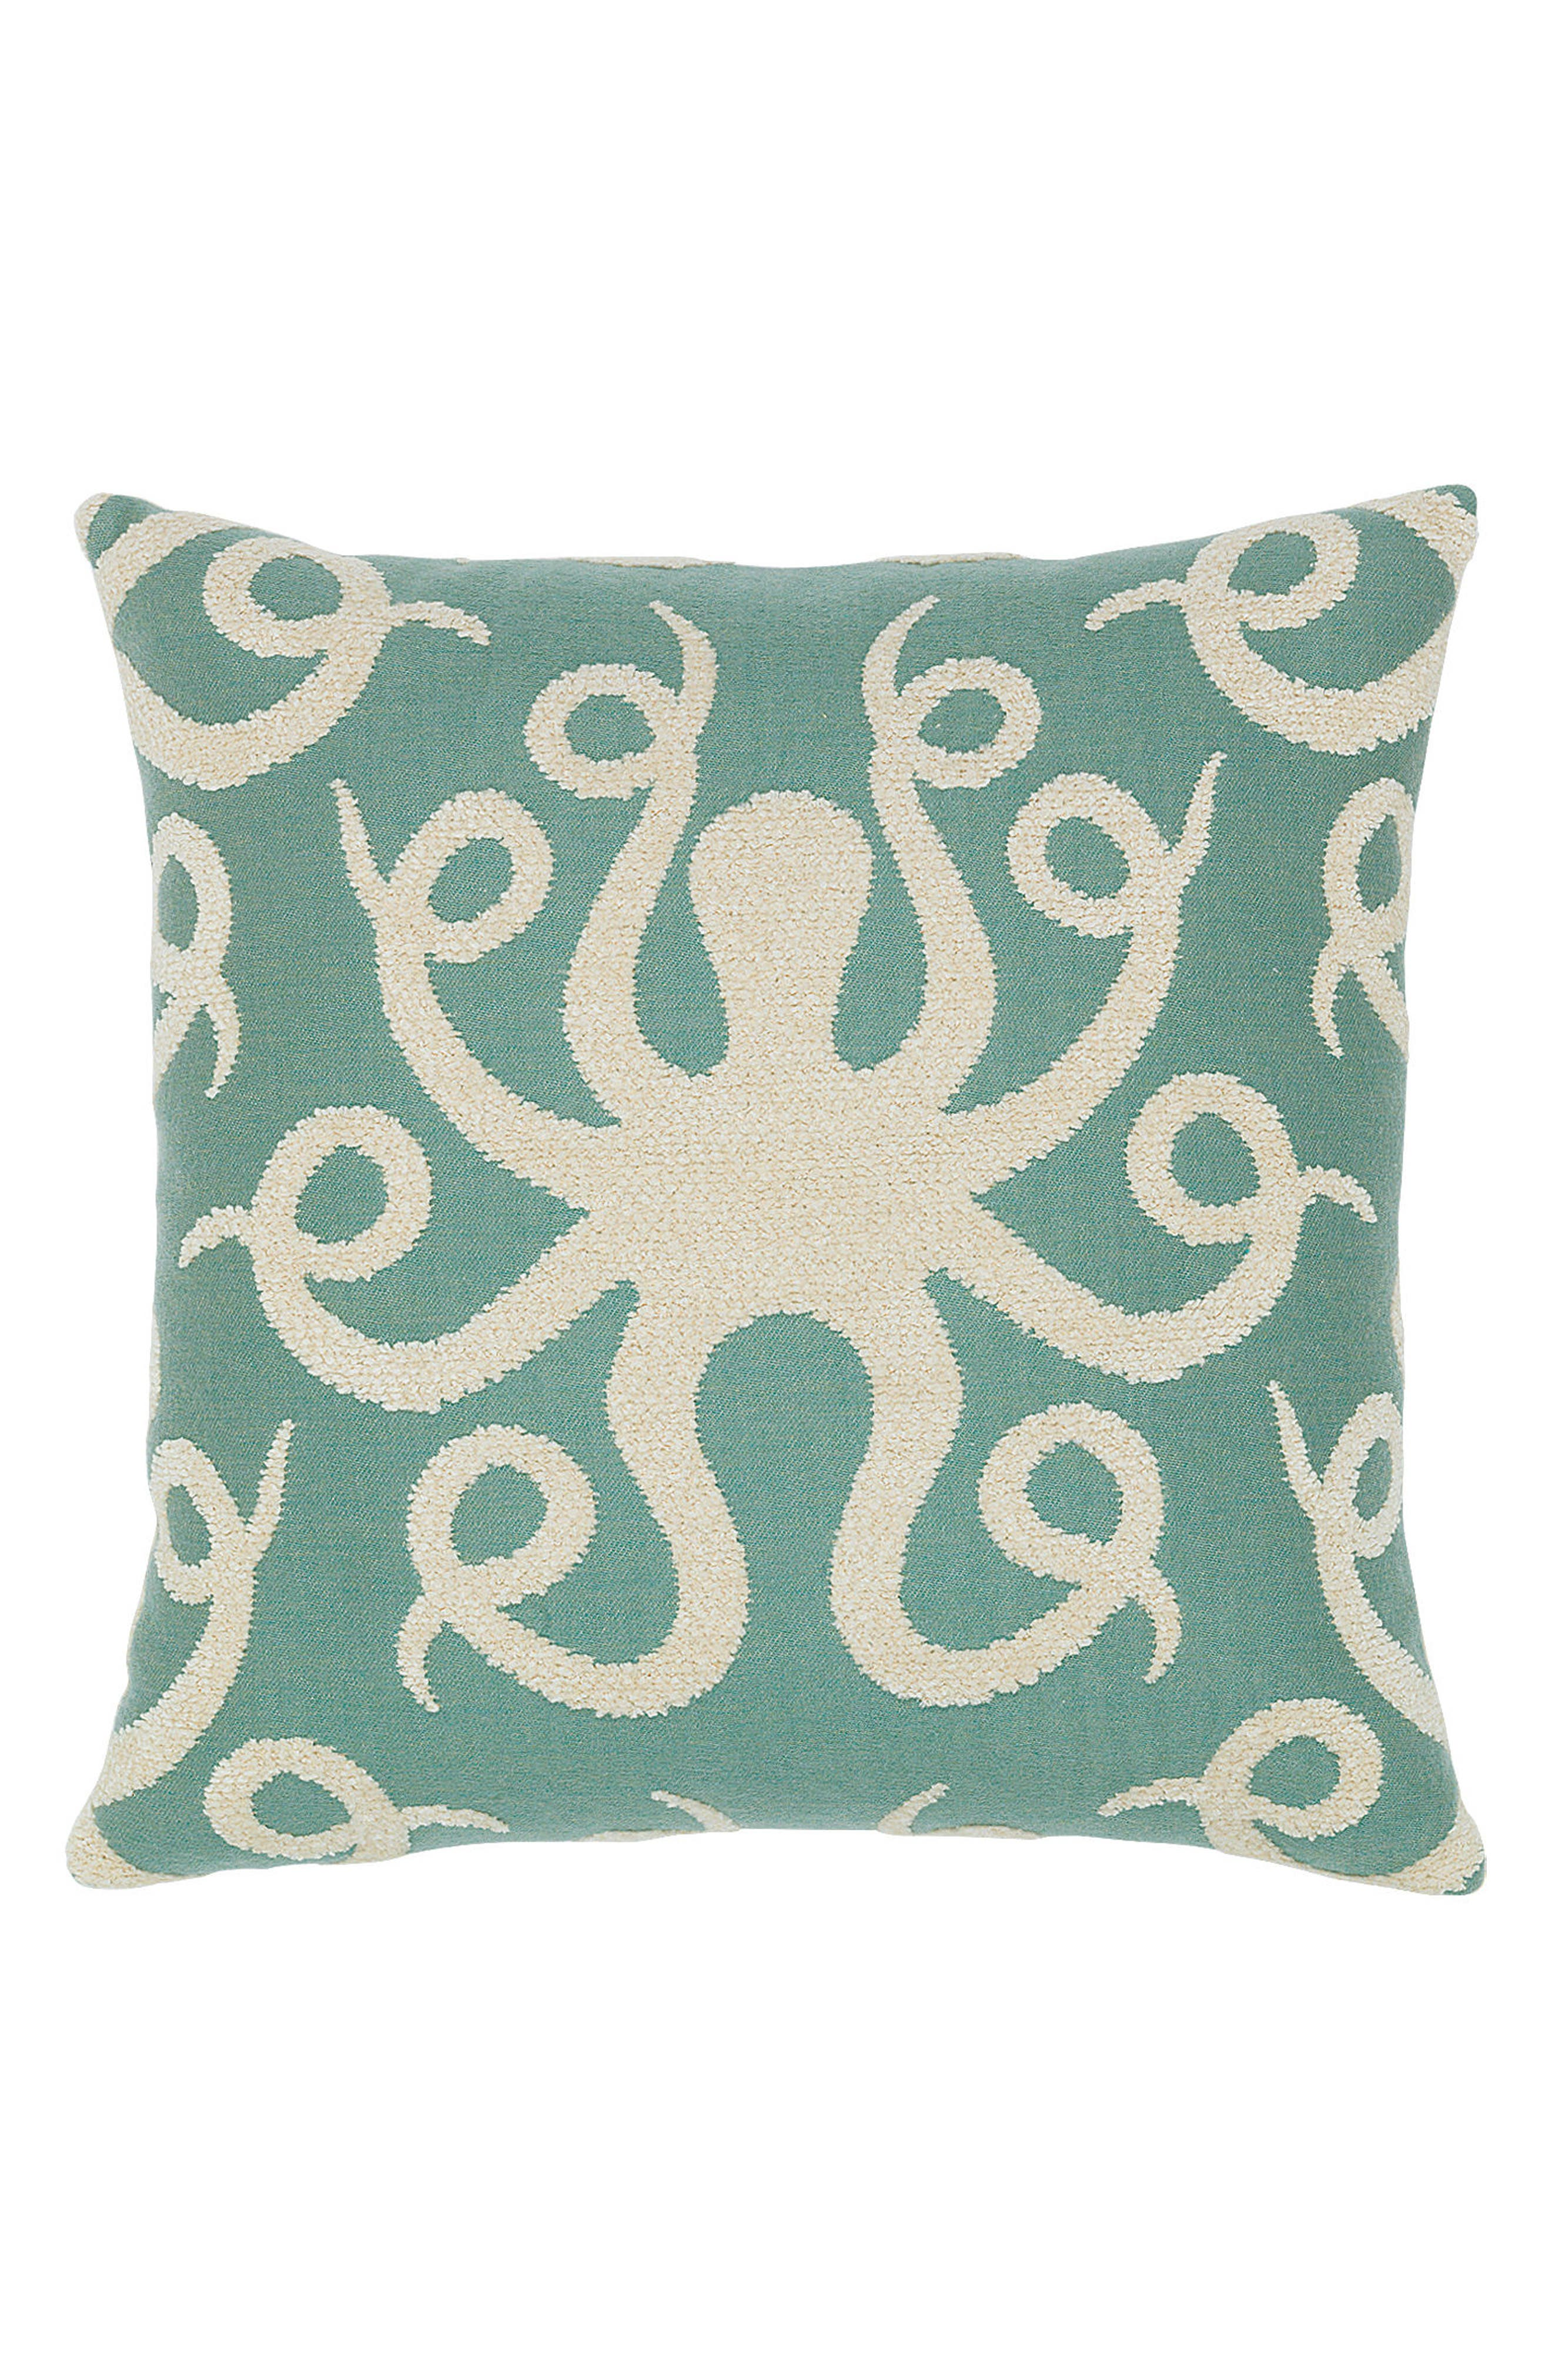 Elaine Smith Octoplush Accent Pillow